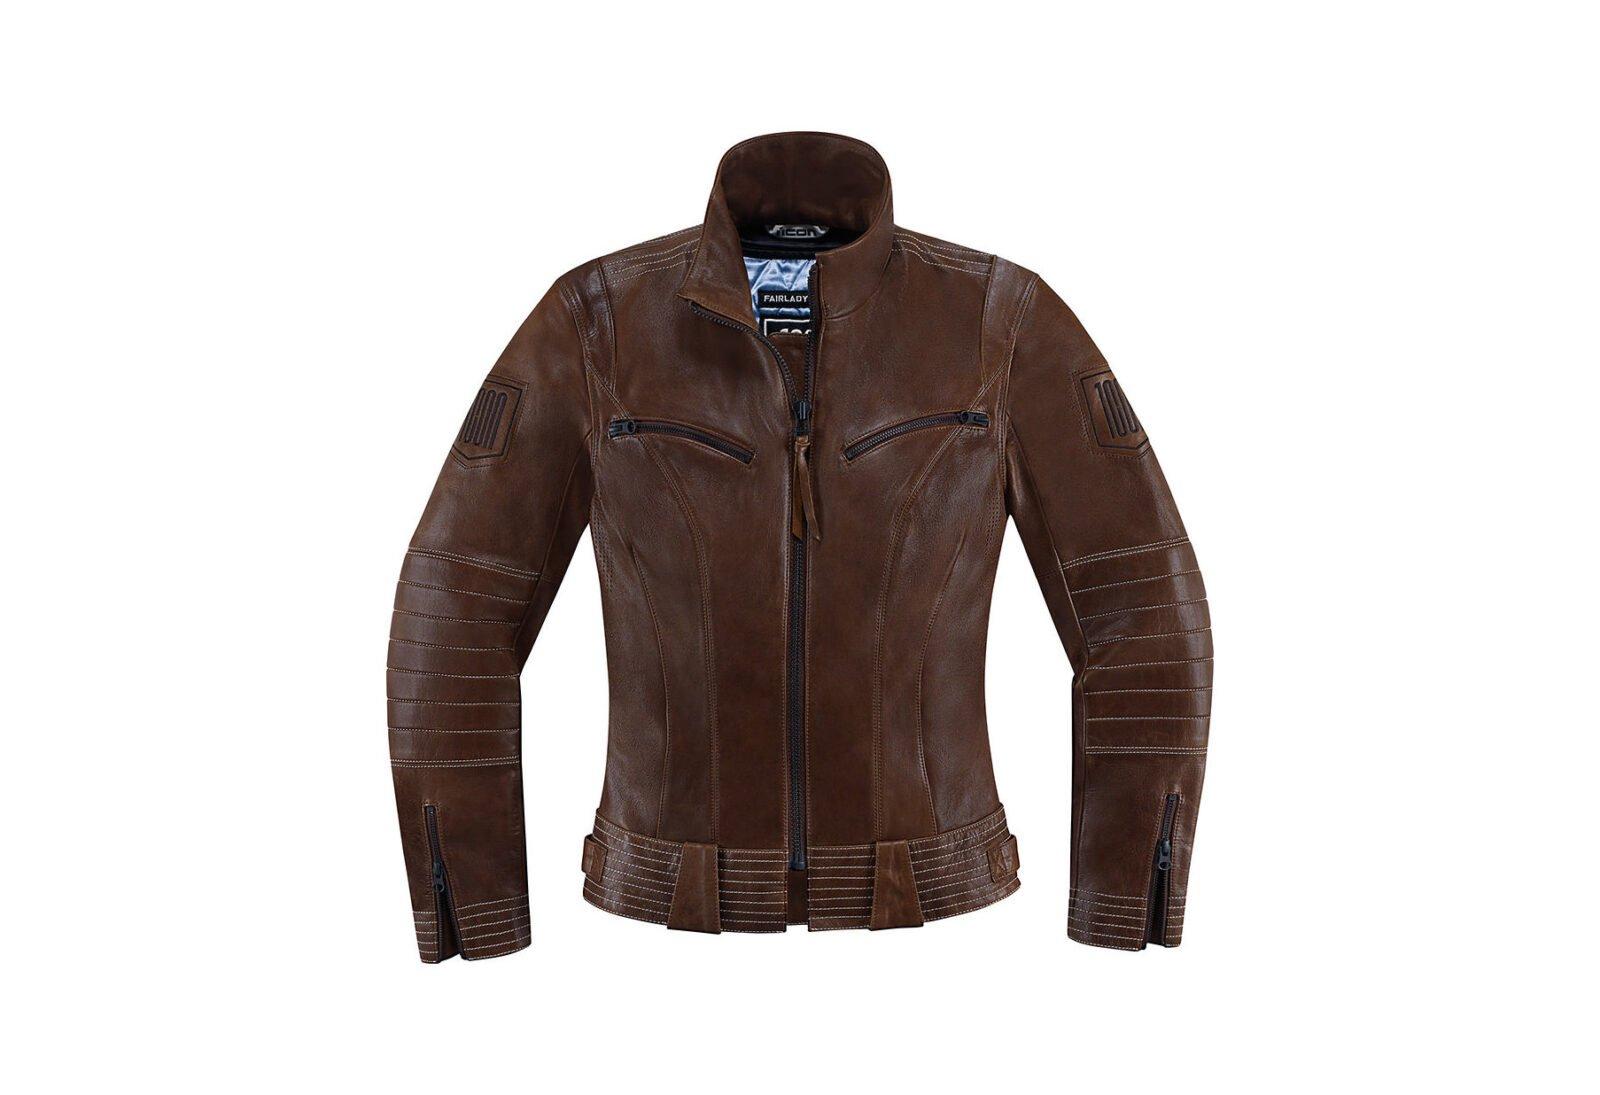 ICON 1000 Fairlady Jacket 1600x1095 - ICON 1000 Fairlady Jacket